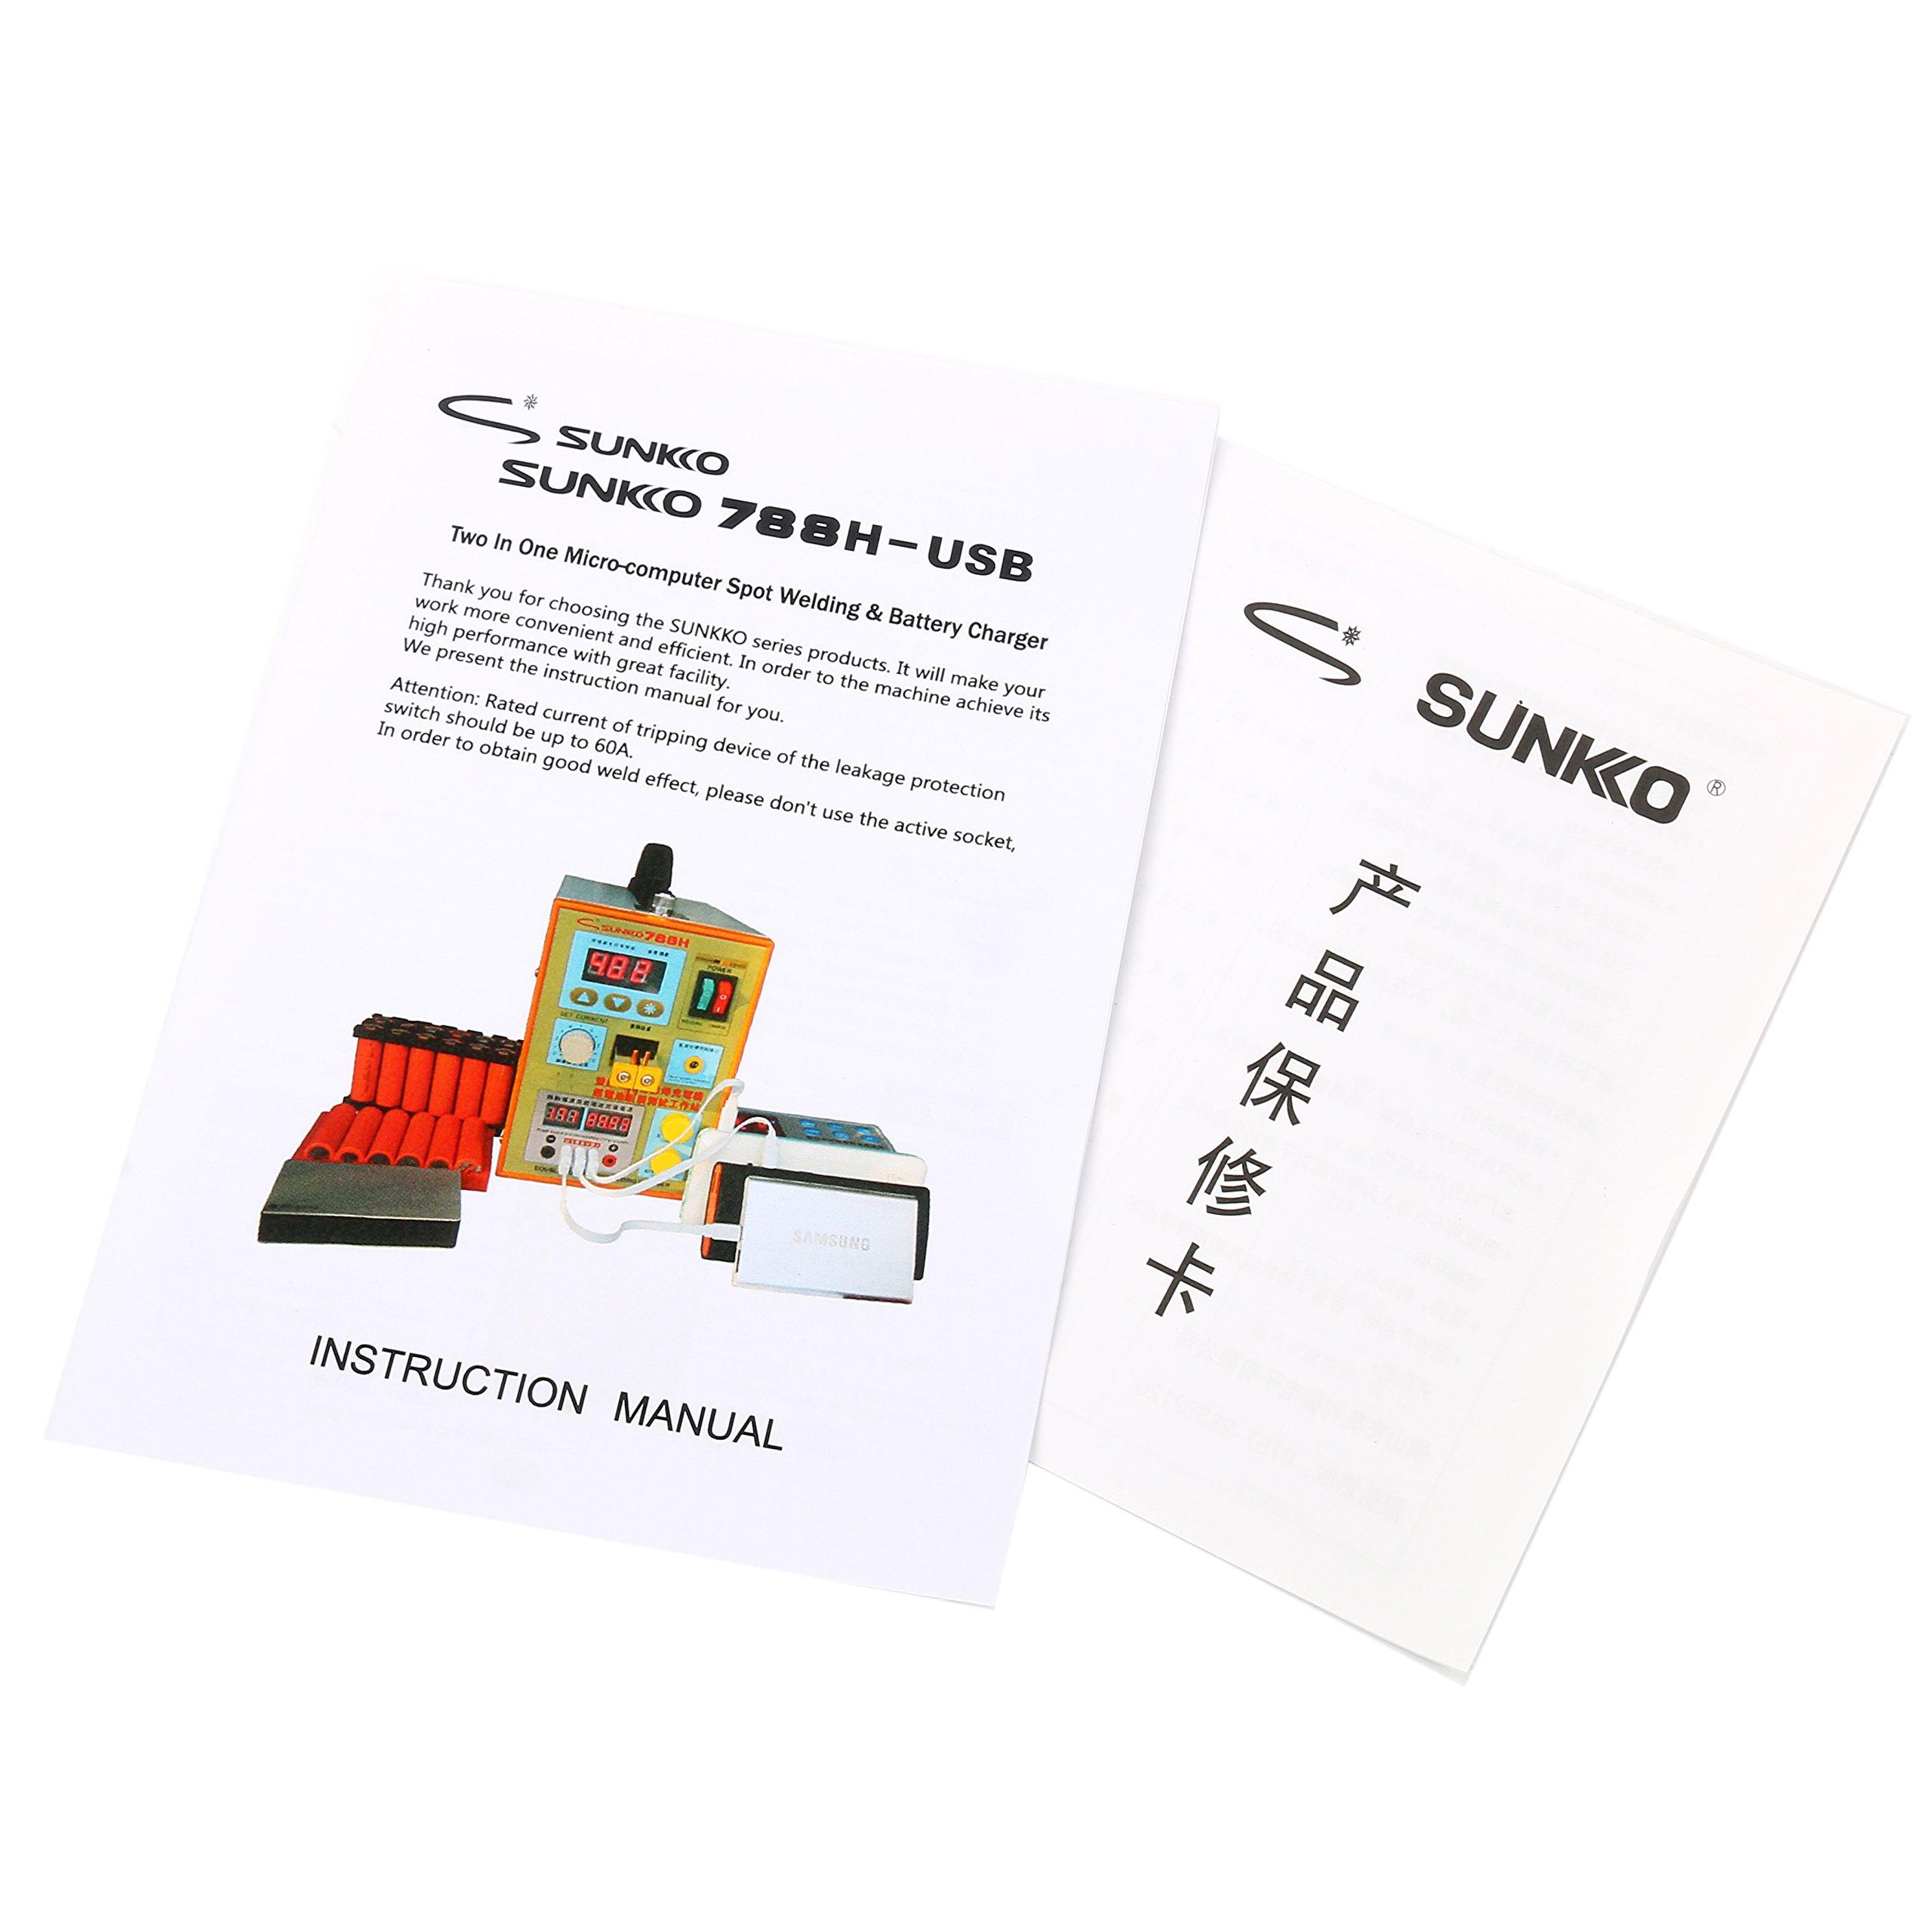 SUNKKO S788H-USB Precision Pulse Spot Welder +CC-CV Charge+Power Bank Test by SUNKKO